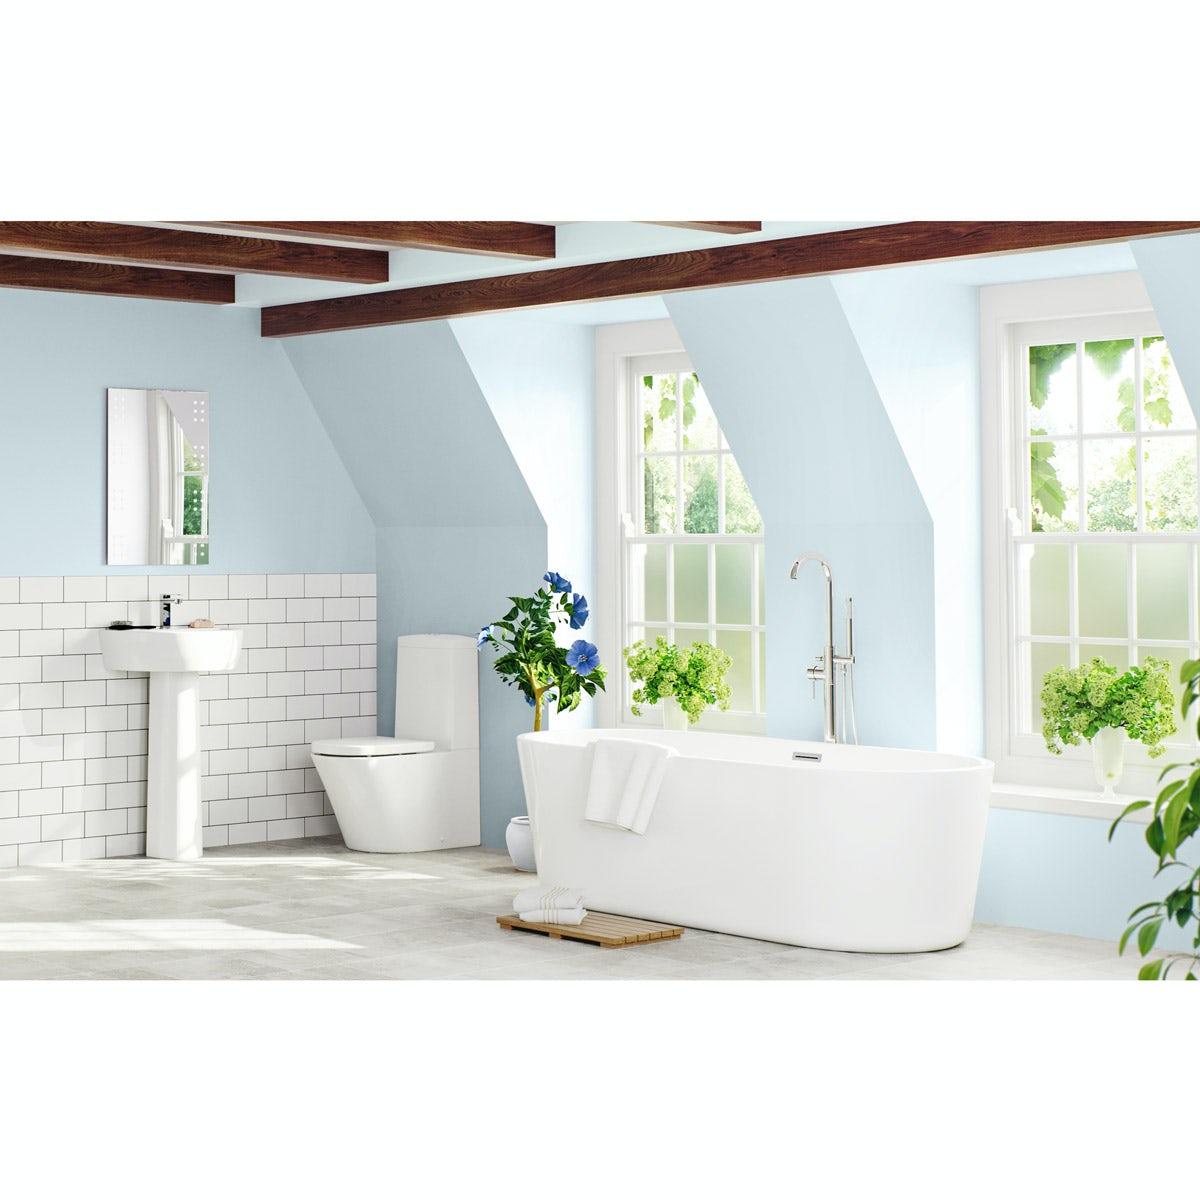 Mode Tate Luxury Bathroom Suite With Freestanding Bath 1500 X 700